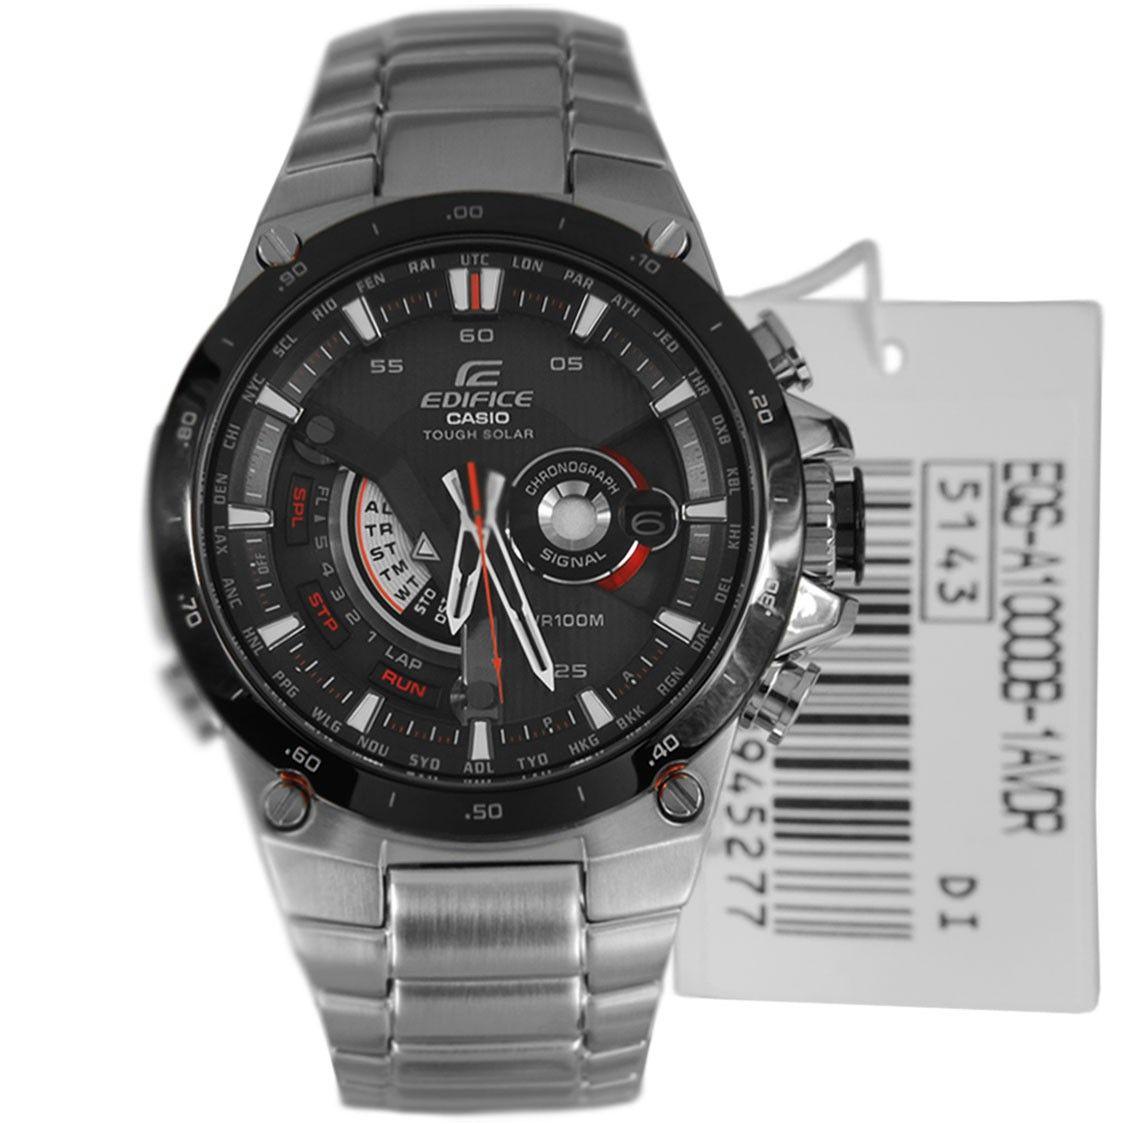 7137be0b8bb Casio Edifice Red Bull Racing Watch EQS-A1000DB-1AVDR